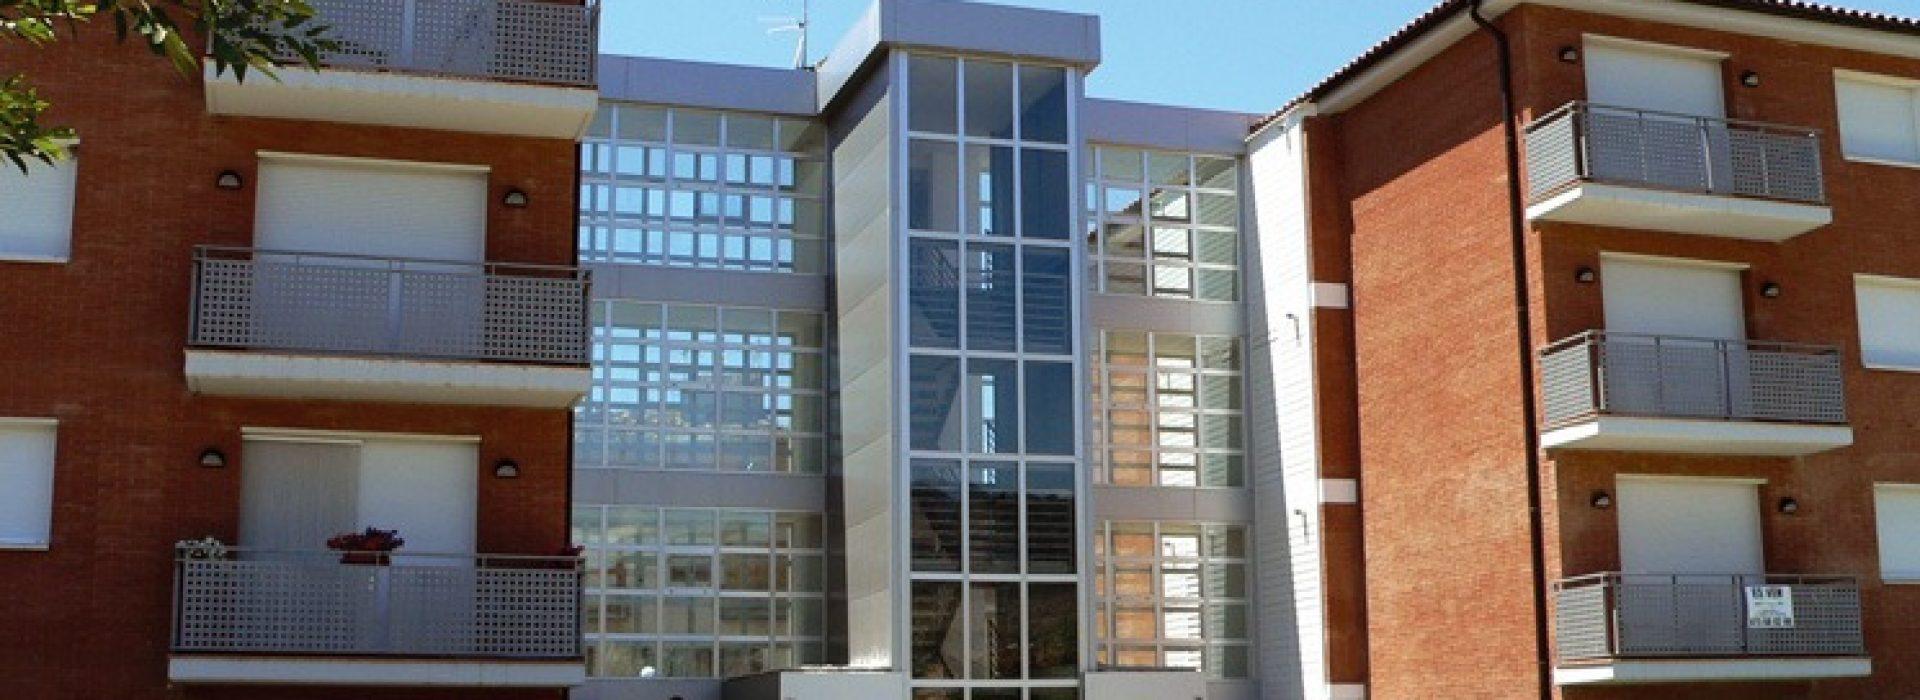 residencial-filià-illa-f01